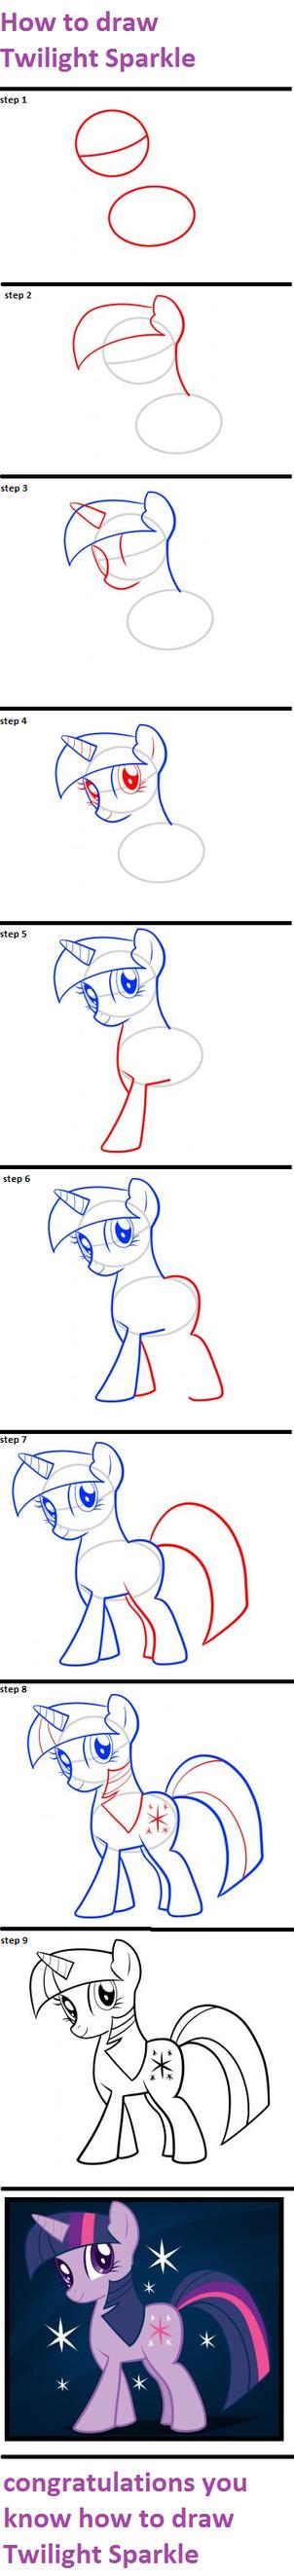 how to draw twilight sparkle eyes